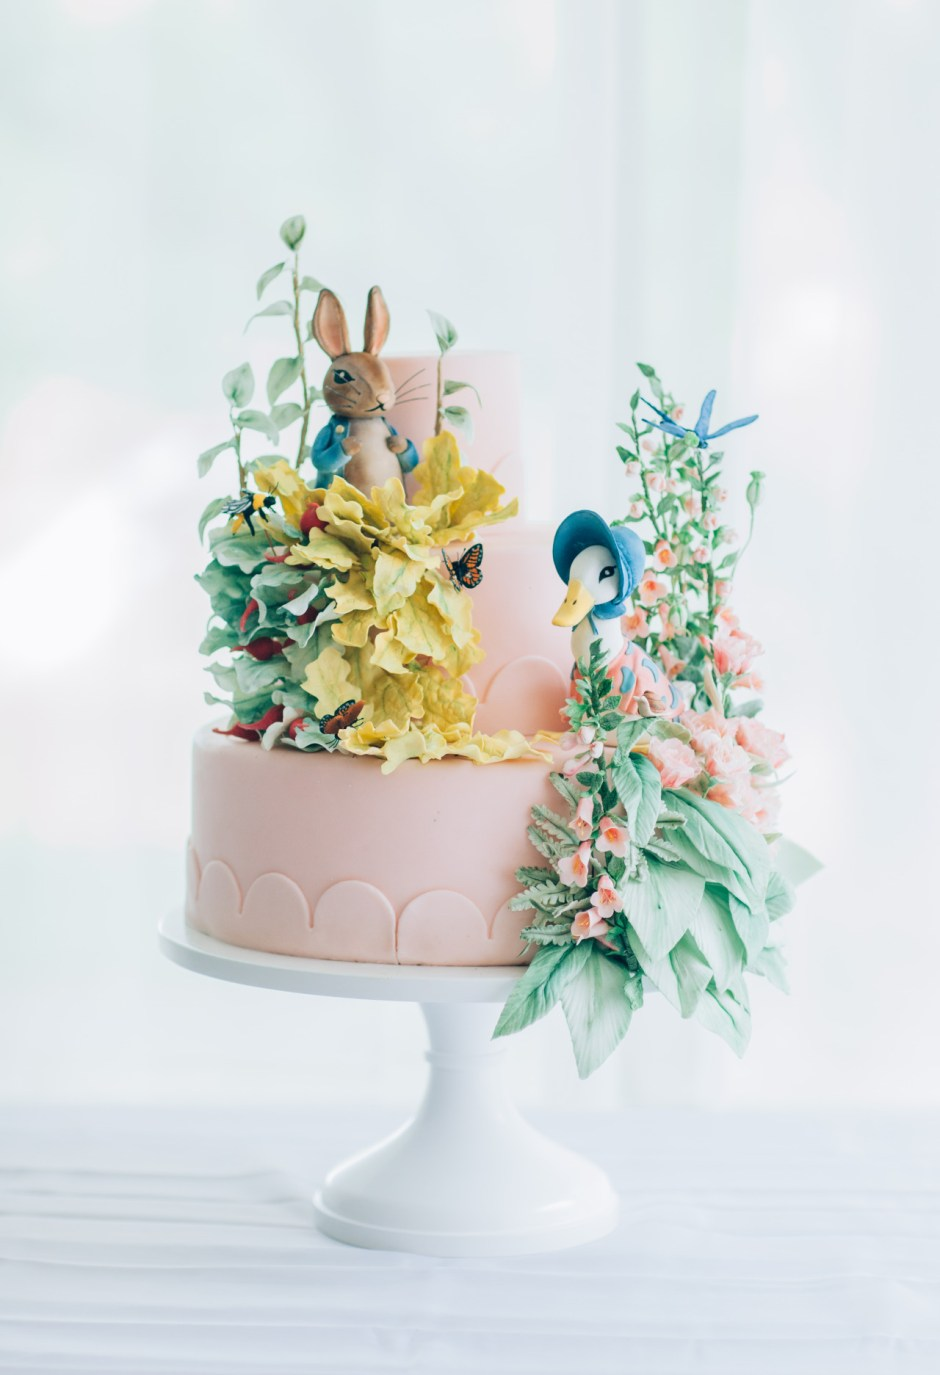 Mischief Maker Cakes I Beatrix Potter Cake I Peter Rabbit Cake I Jemima Puddleduck Cake   I First Birthday Cake I Beatrix Potter First Birthday  #beatrixpotter #beatrixpottercake #beatrixpotterparty